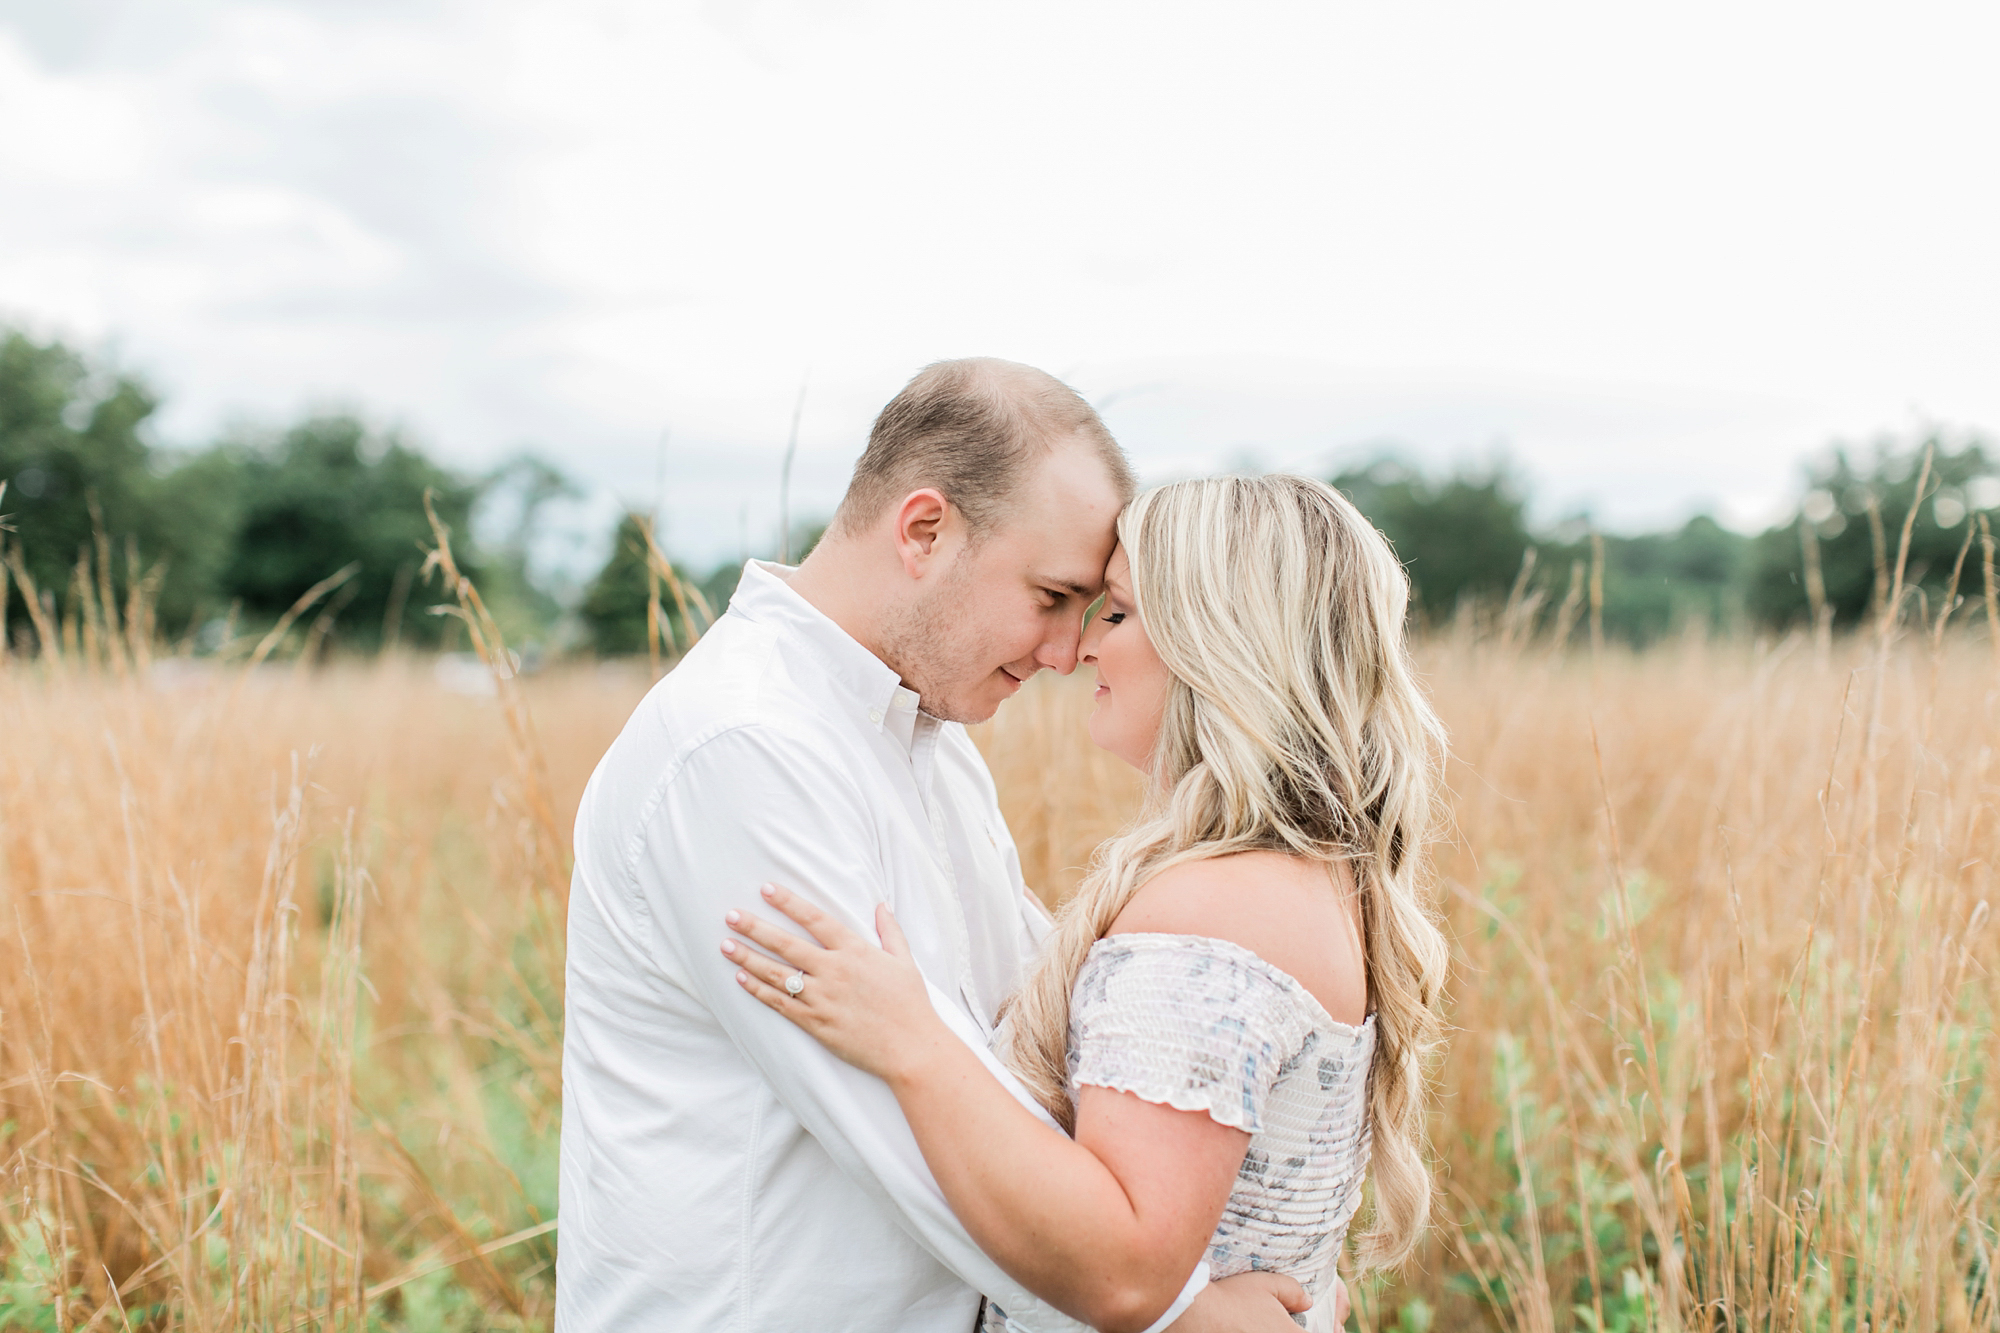 Natalie Broach Photography | Katelin and Austin Engagement Session | Jacksonville Florida Engagement Photographer | North Florida Photographer